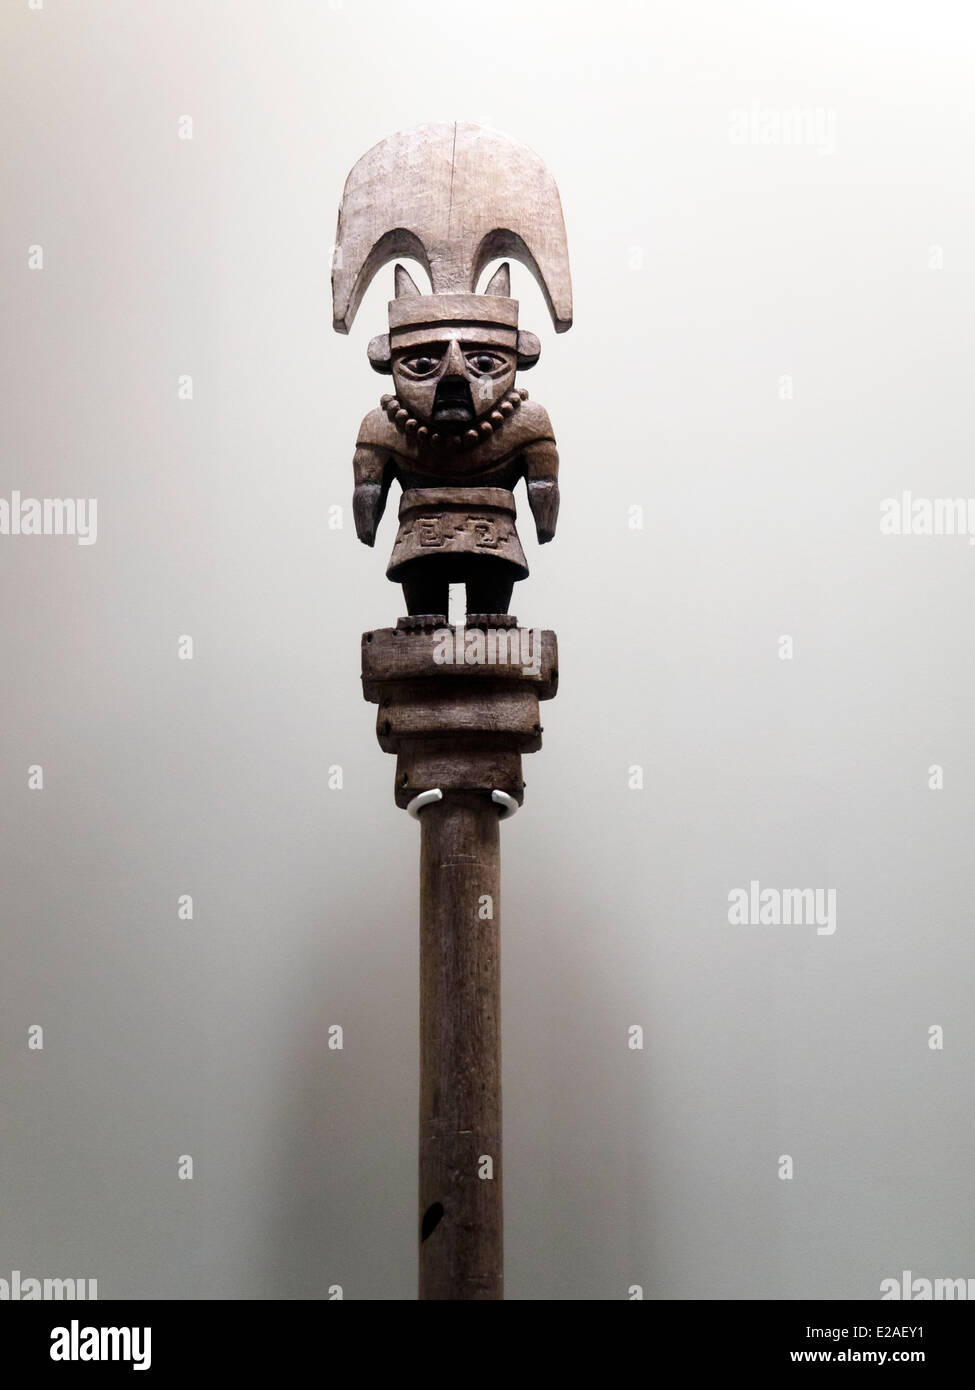 Ceremonial staff detail Mochica Classic period 1-800 AD Museo de Arte Precolombino, Cusco - Peru  From time immemorial - Stock Image